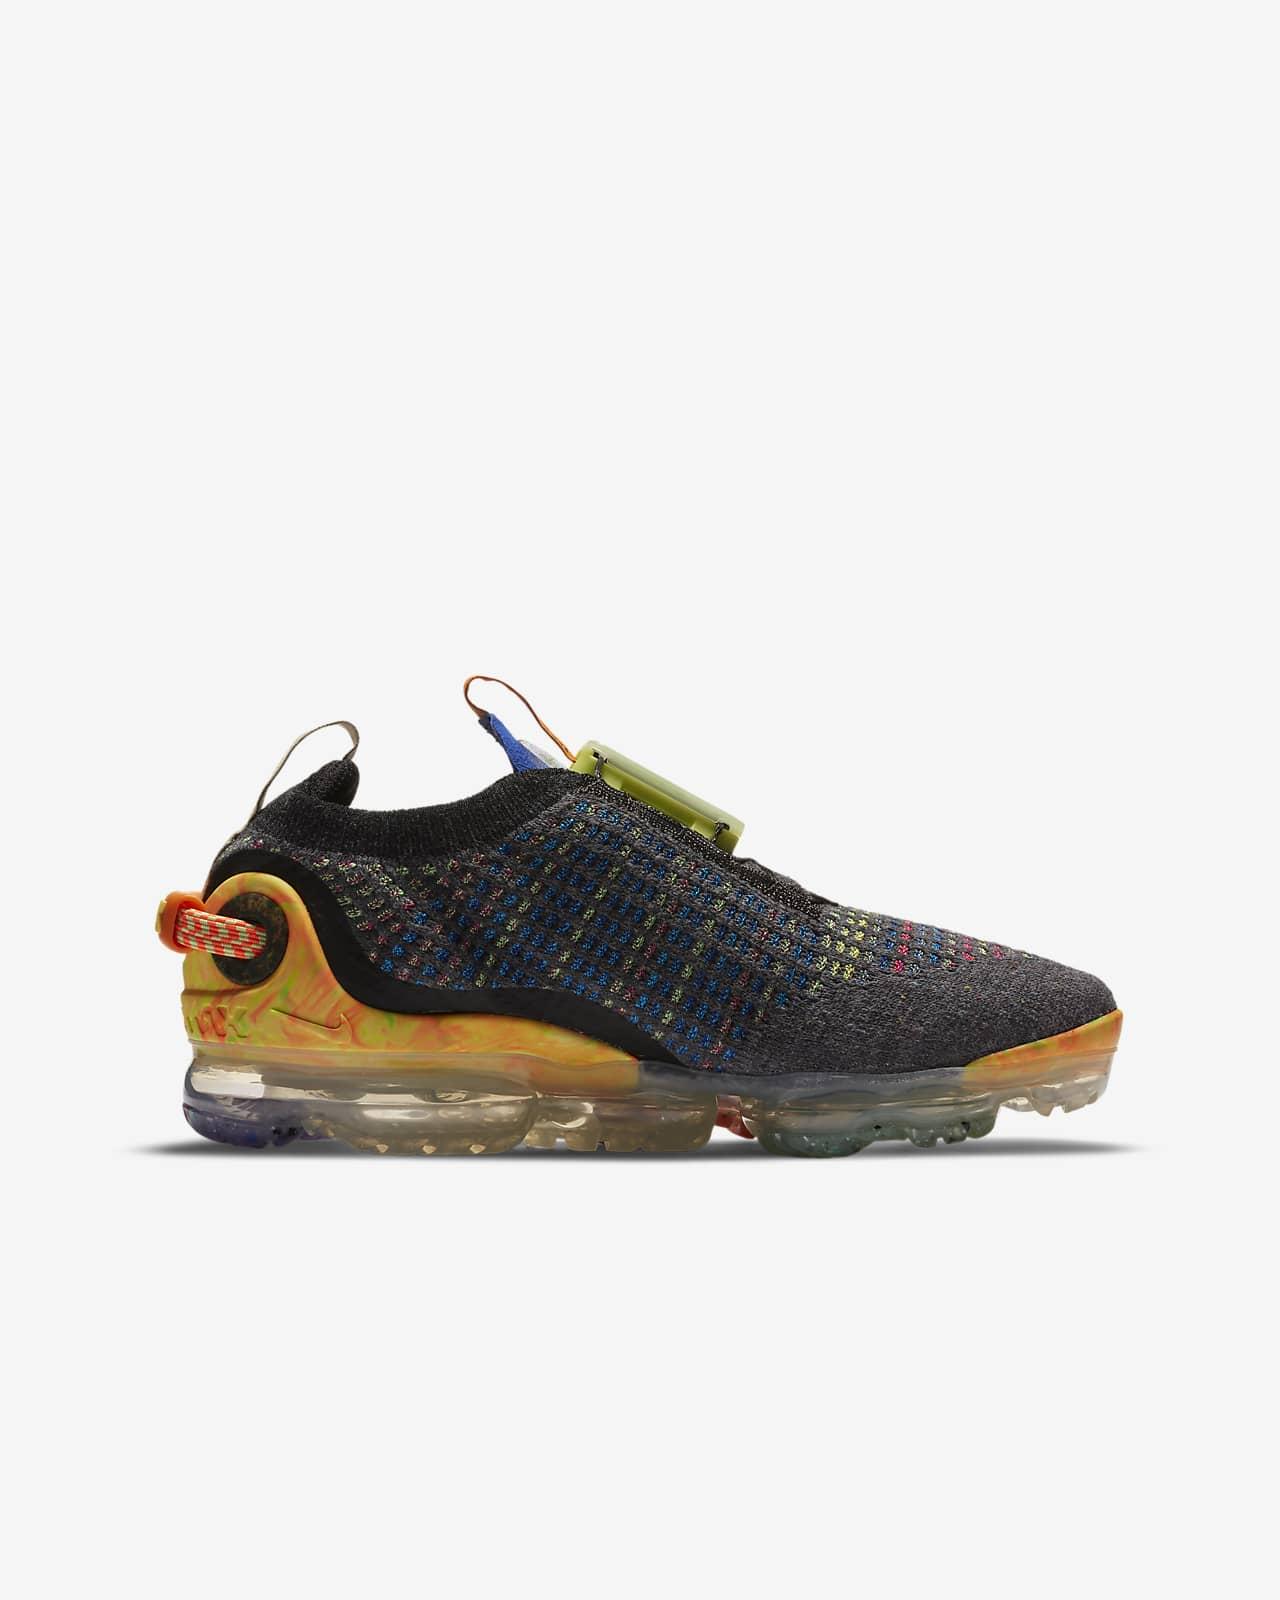 Cheap Vapormax 2020, Cheapest Nike Vapormax 2020 Shoes Sale